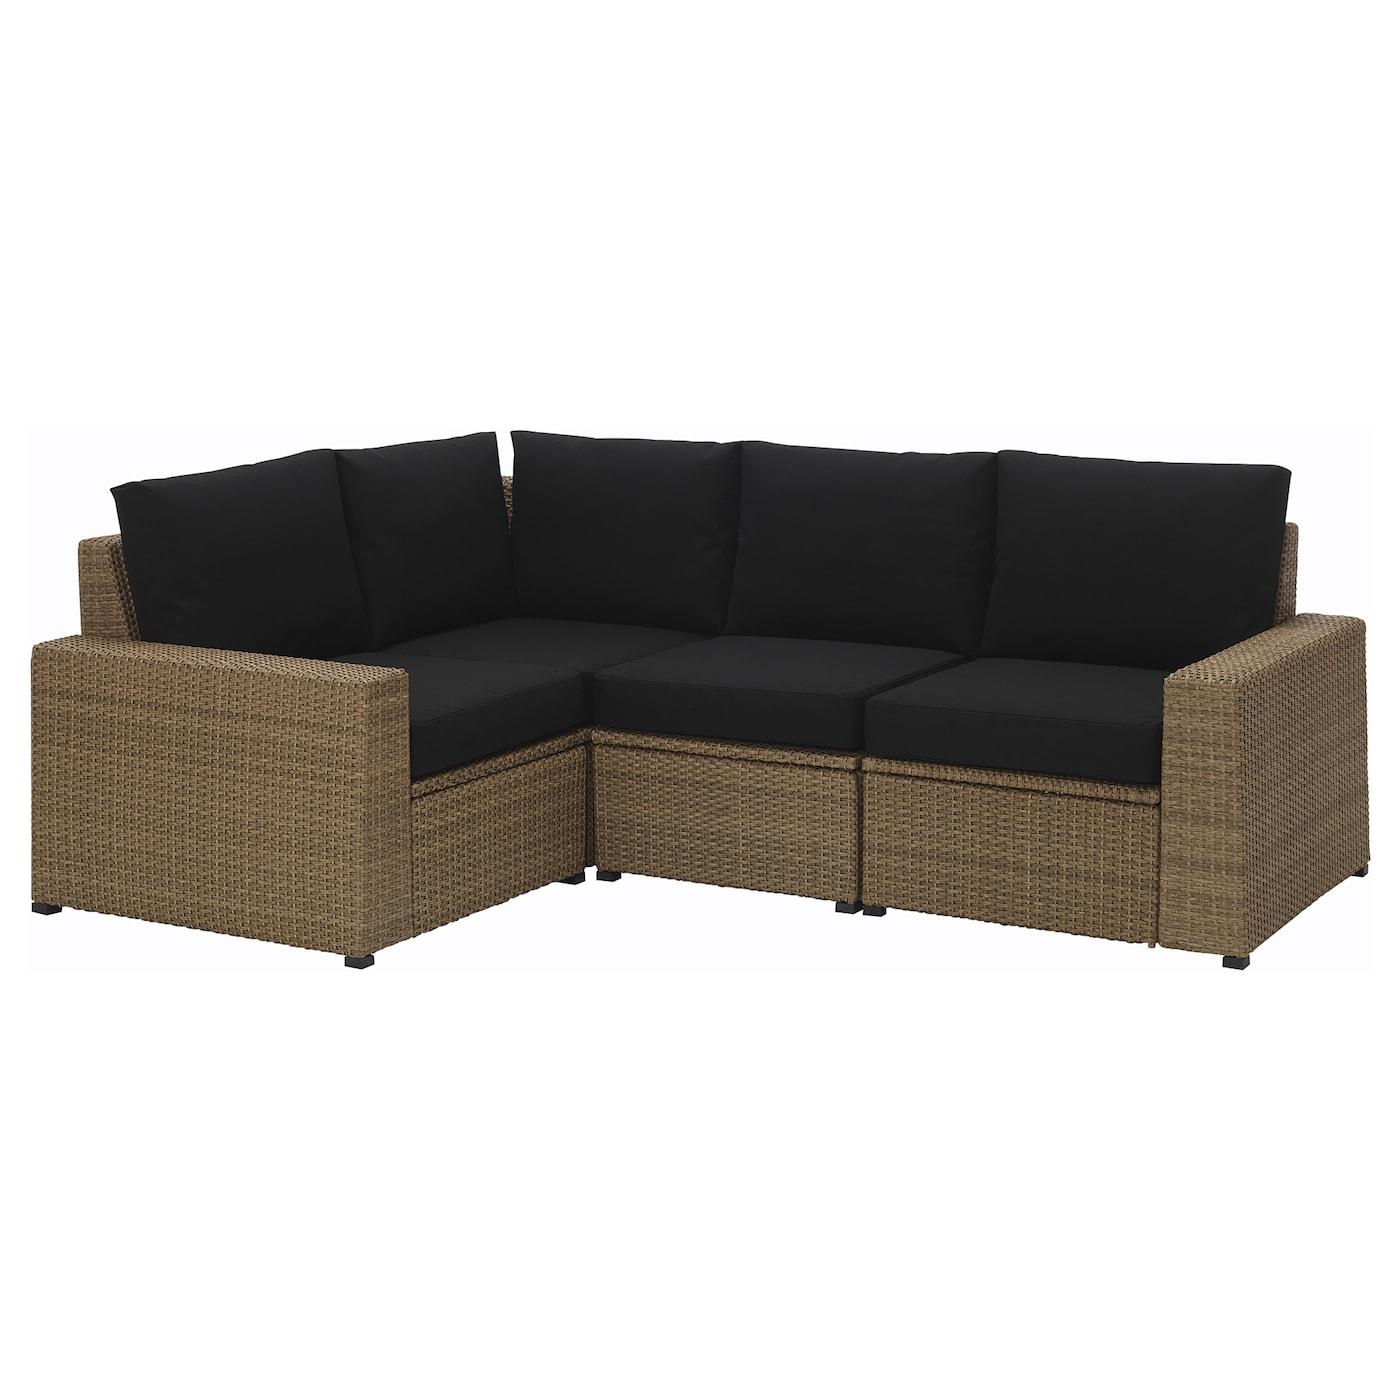 Soller n corner sofa 3 1 outdoor brown kungs black ikea - Ikea sofa exterior ...